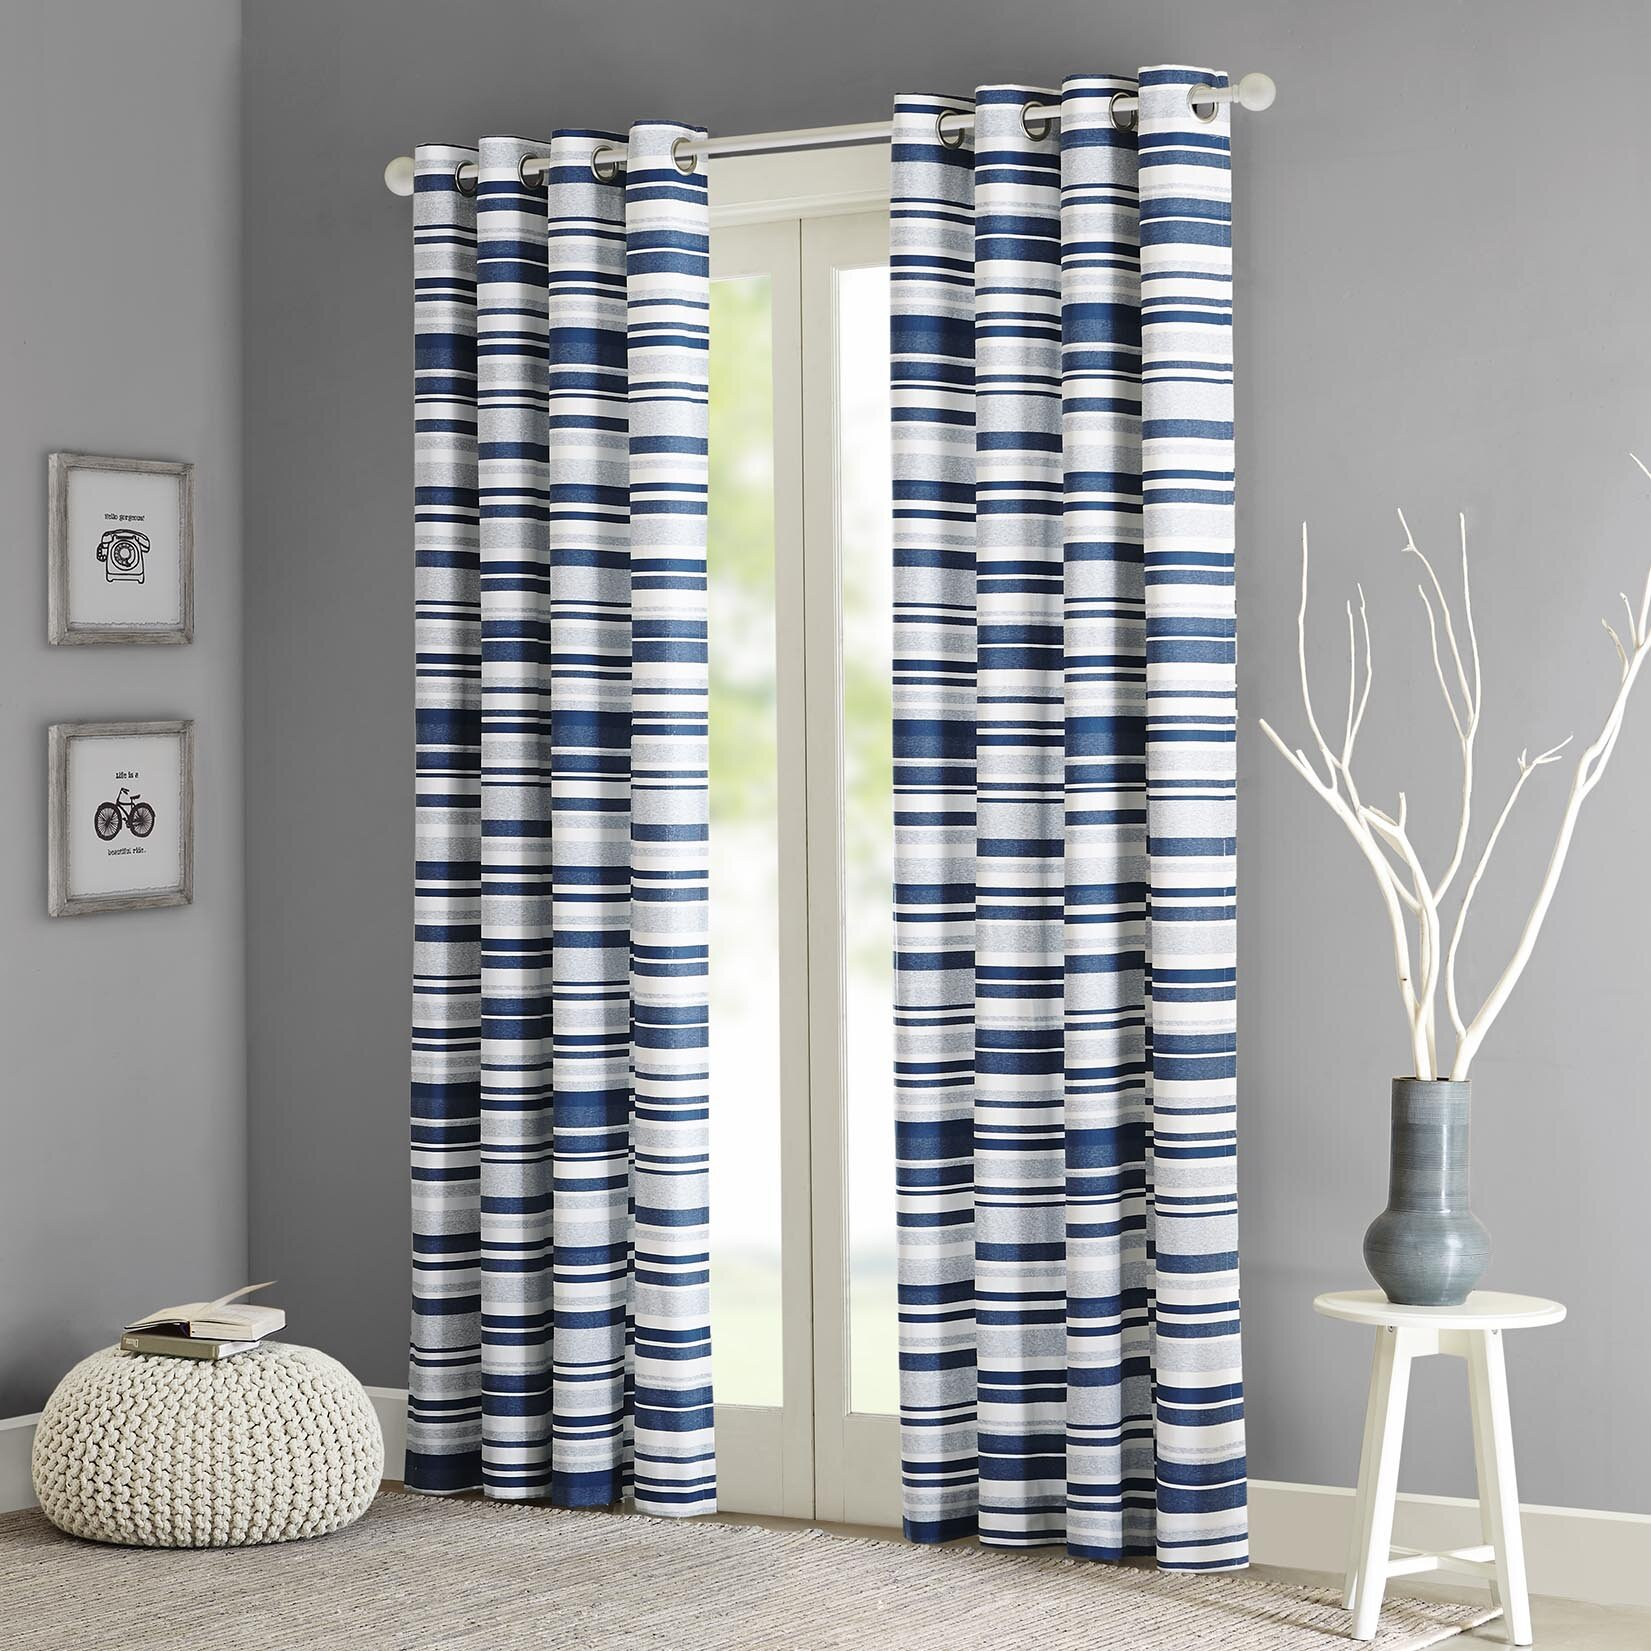 Sheer Ebern Designs Curtains Drapes You Ll Love In 2021 Wayfair